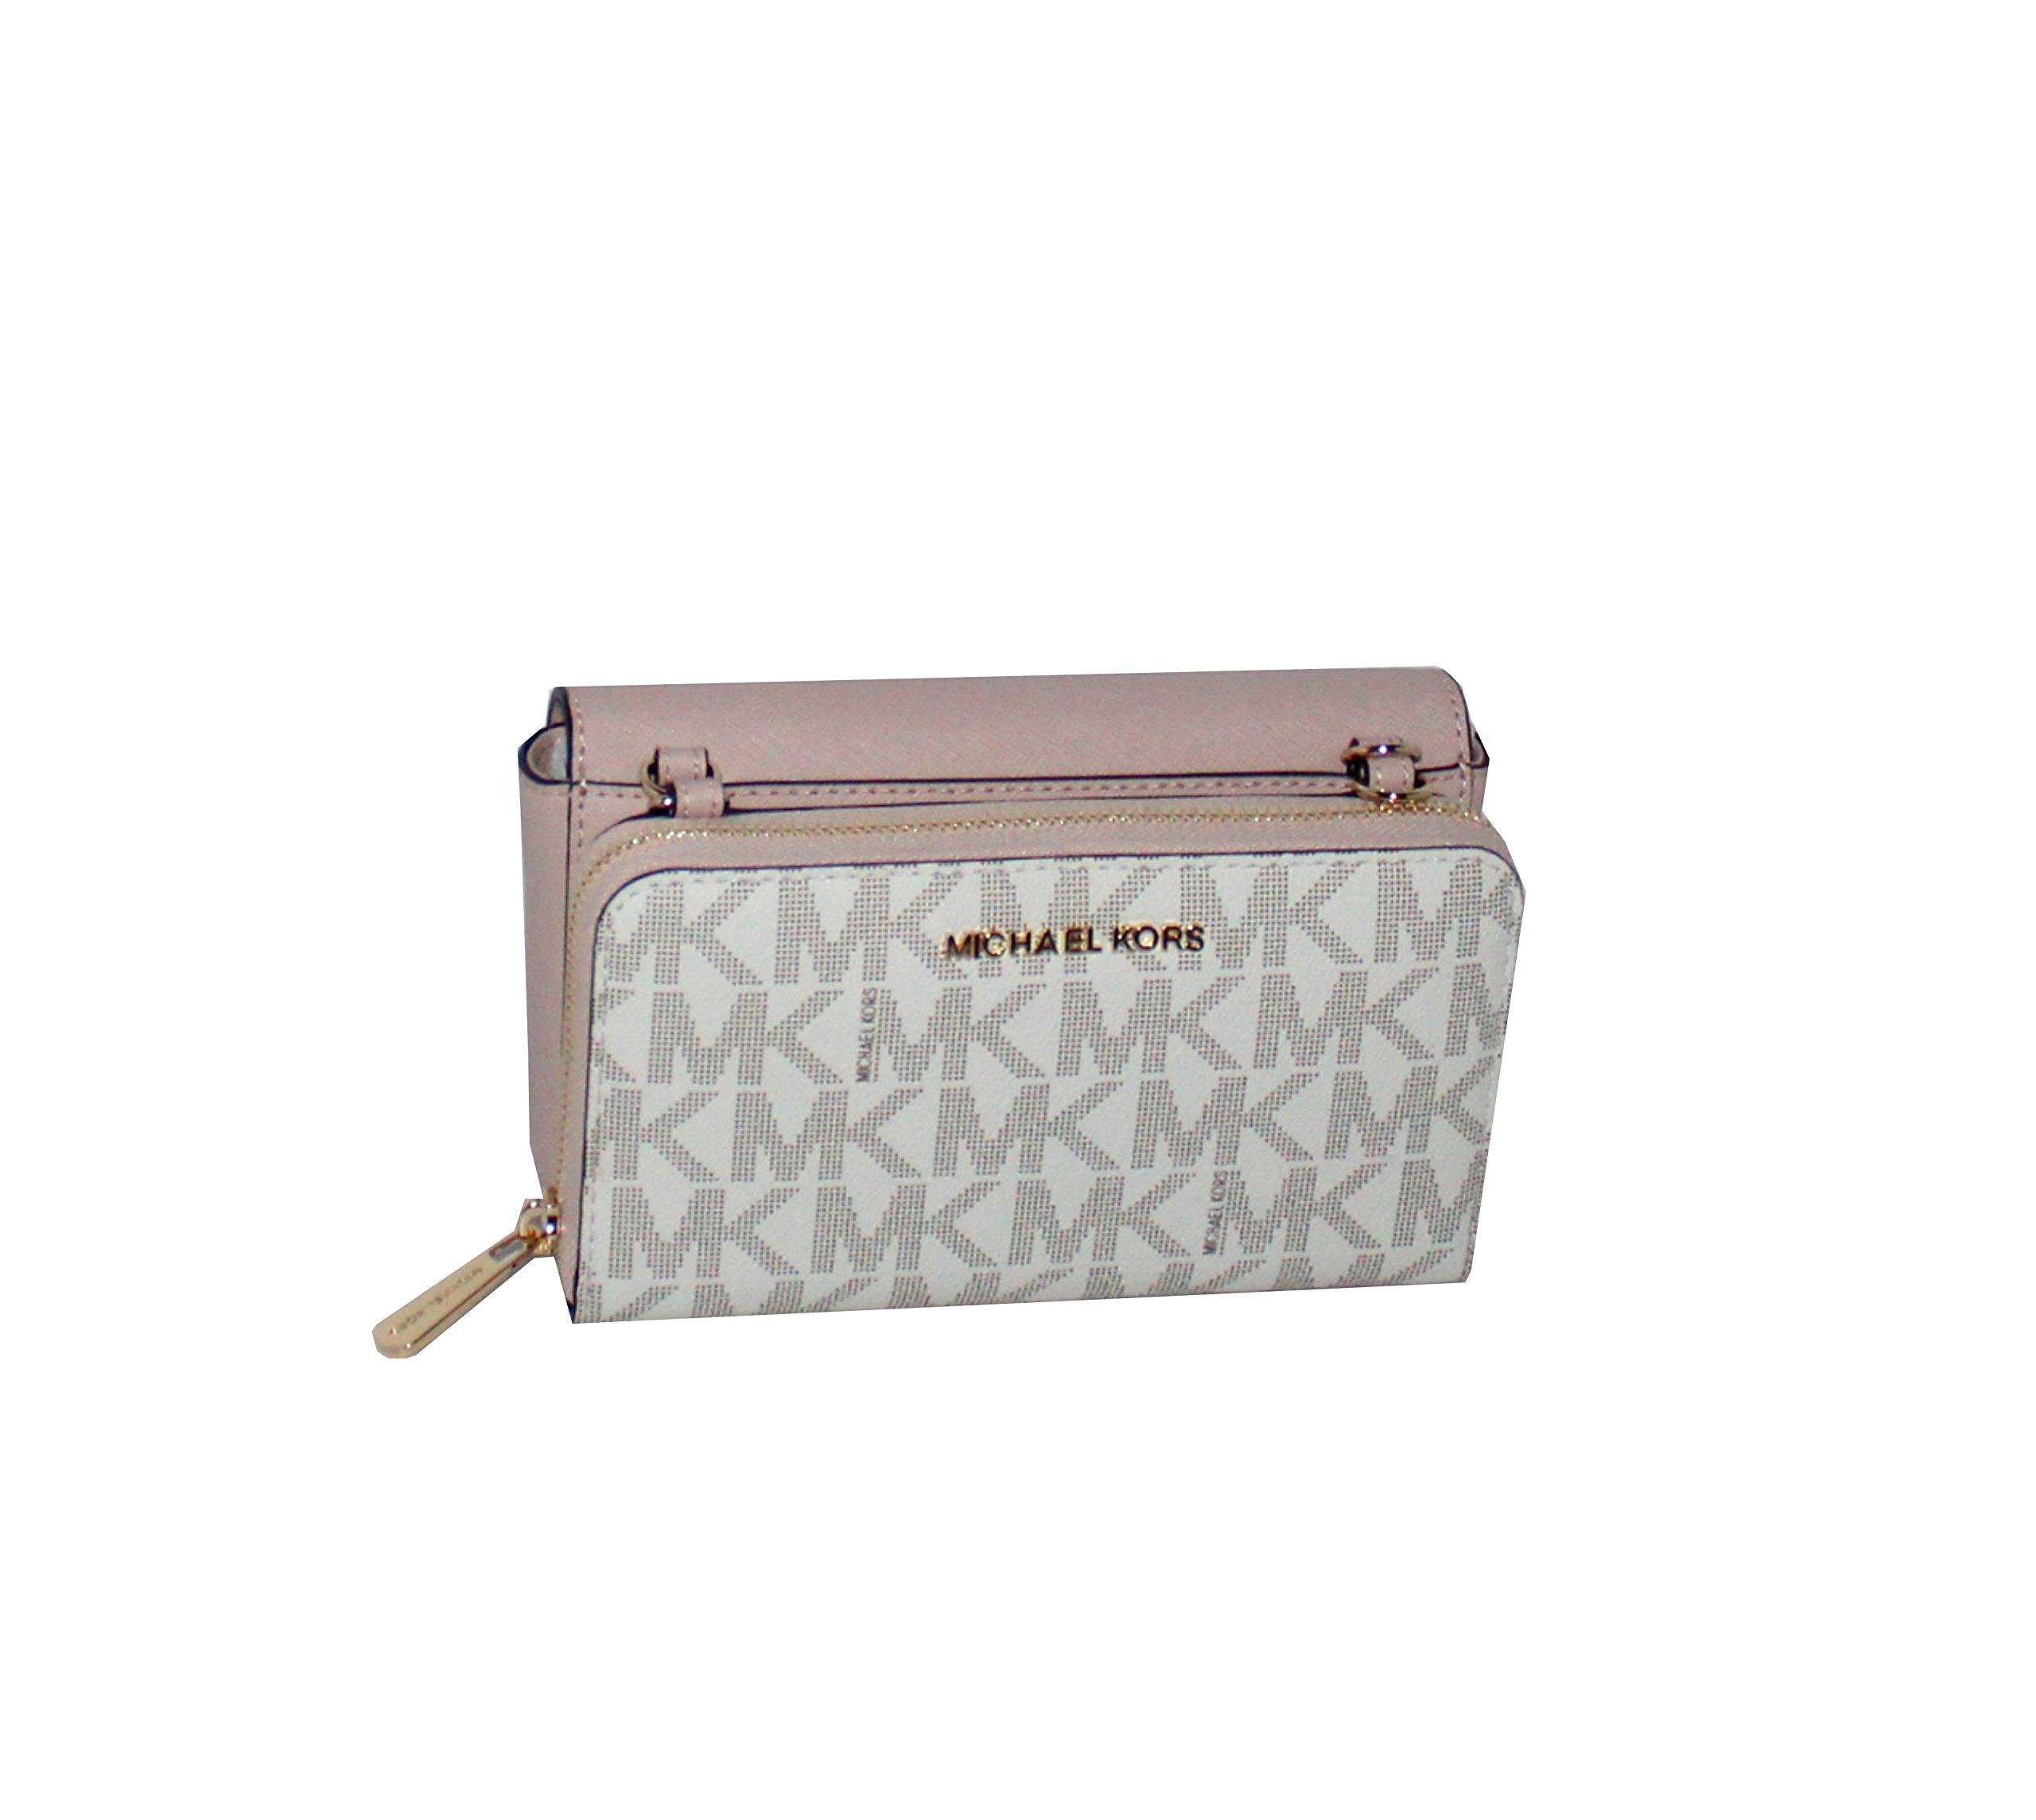 MICHAEL Michael Kors Tina Women's Wallet Clutch Xbody Shoulder Leather Double Bag MK PRINTED